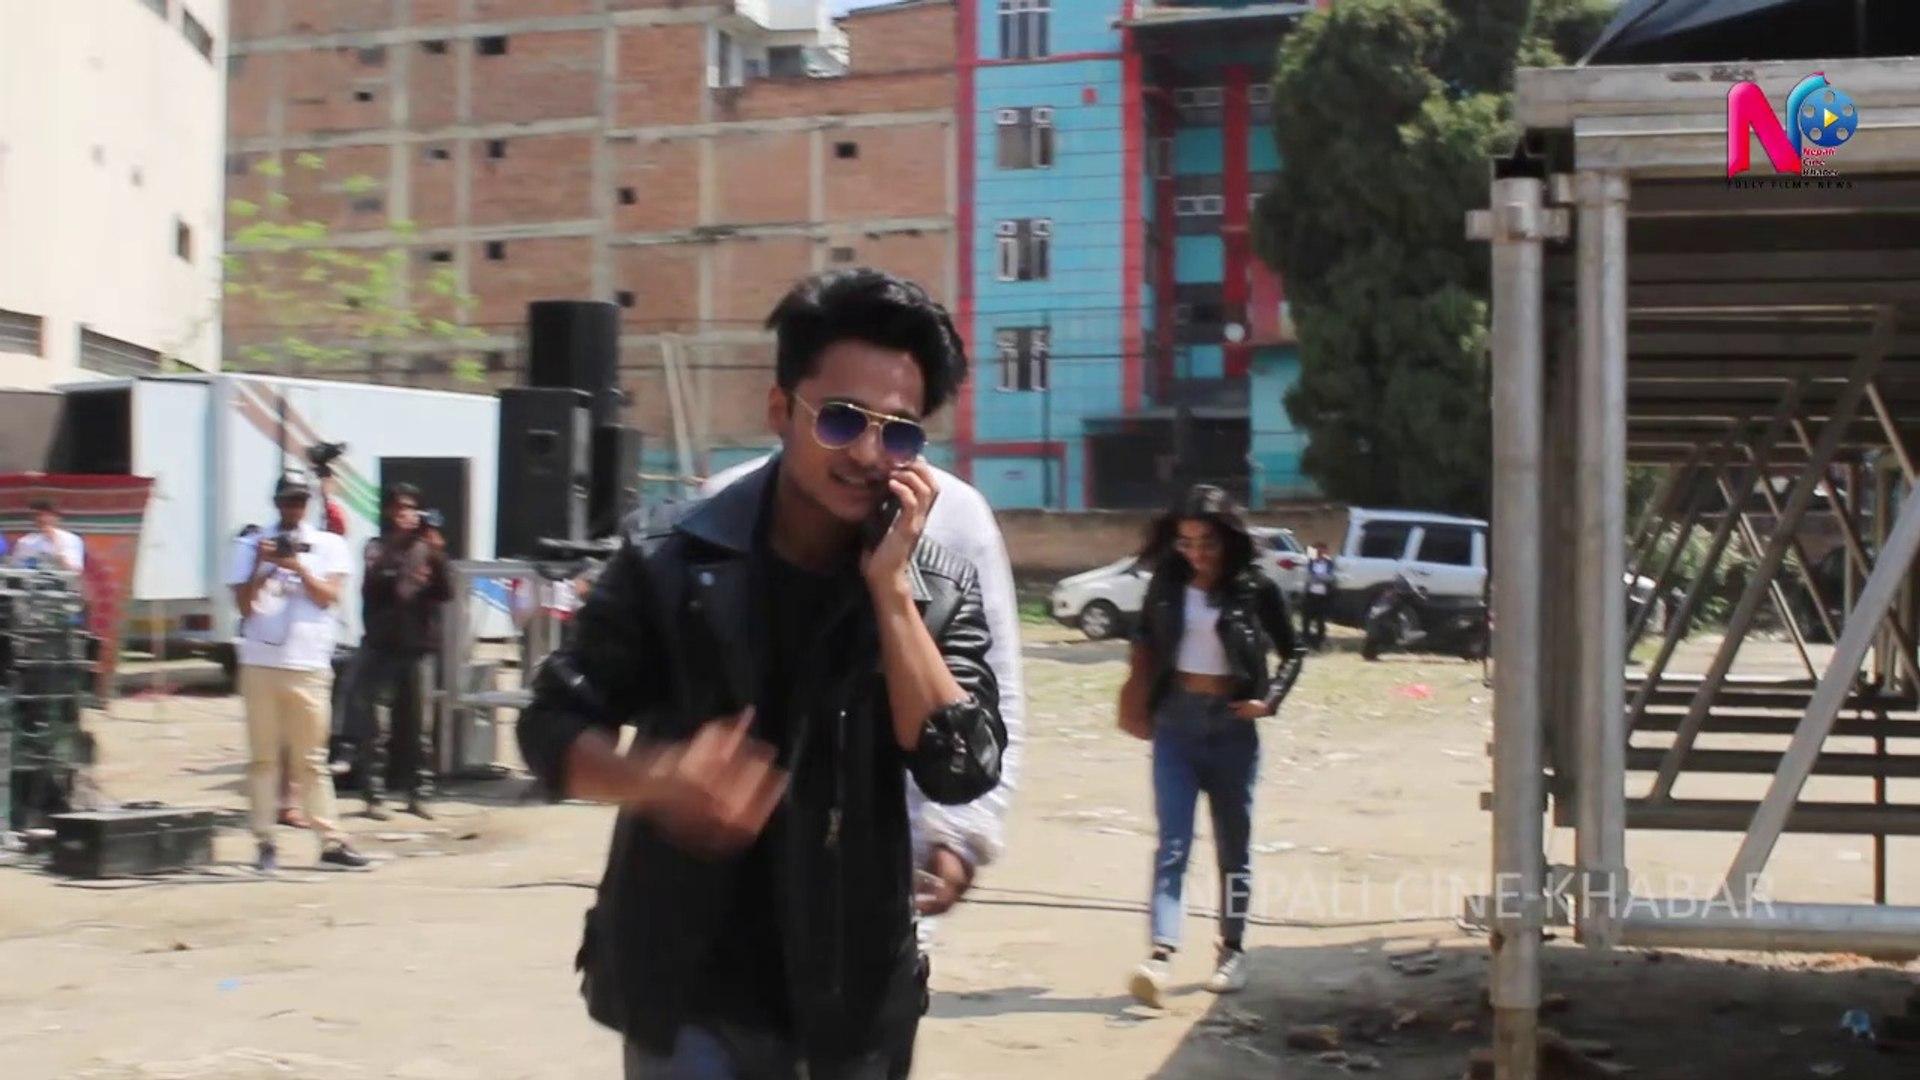 Harihar Adhikari and all Neplai Celebrate play Holi | Nepali festival Holi 2019